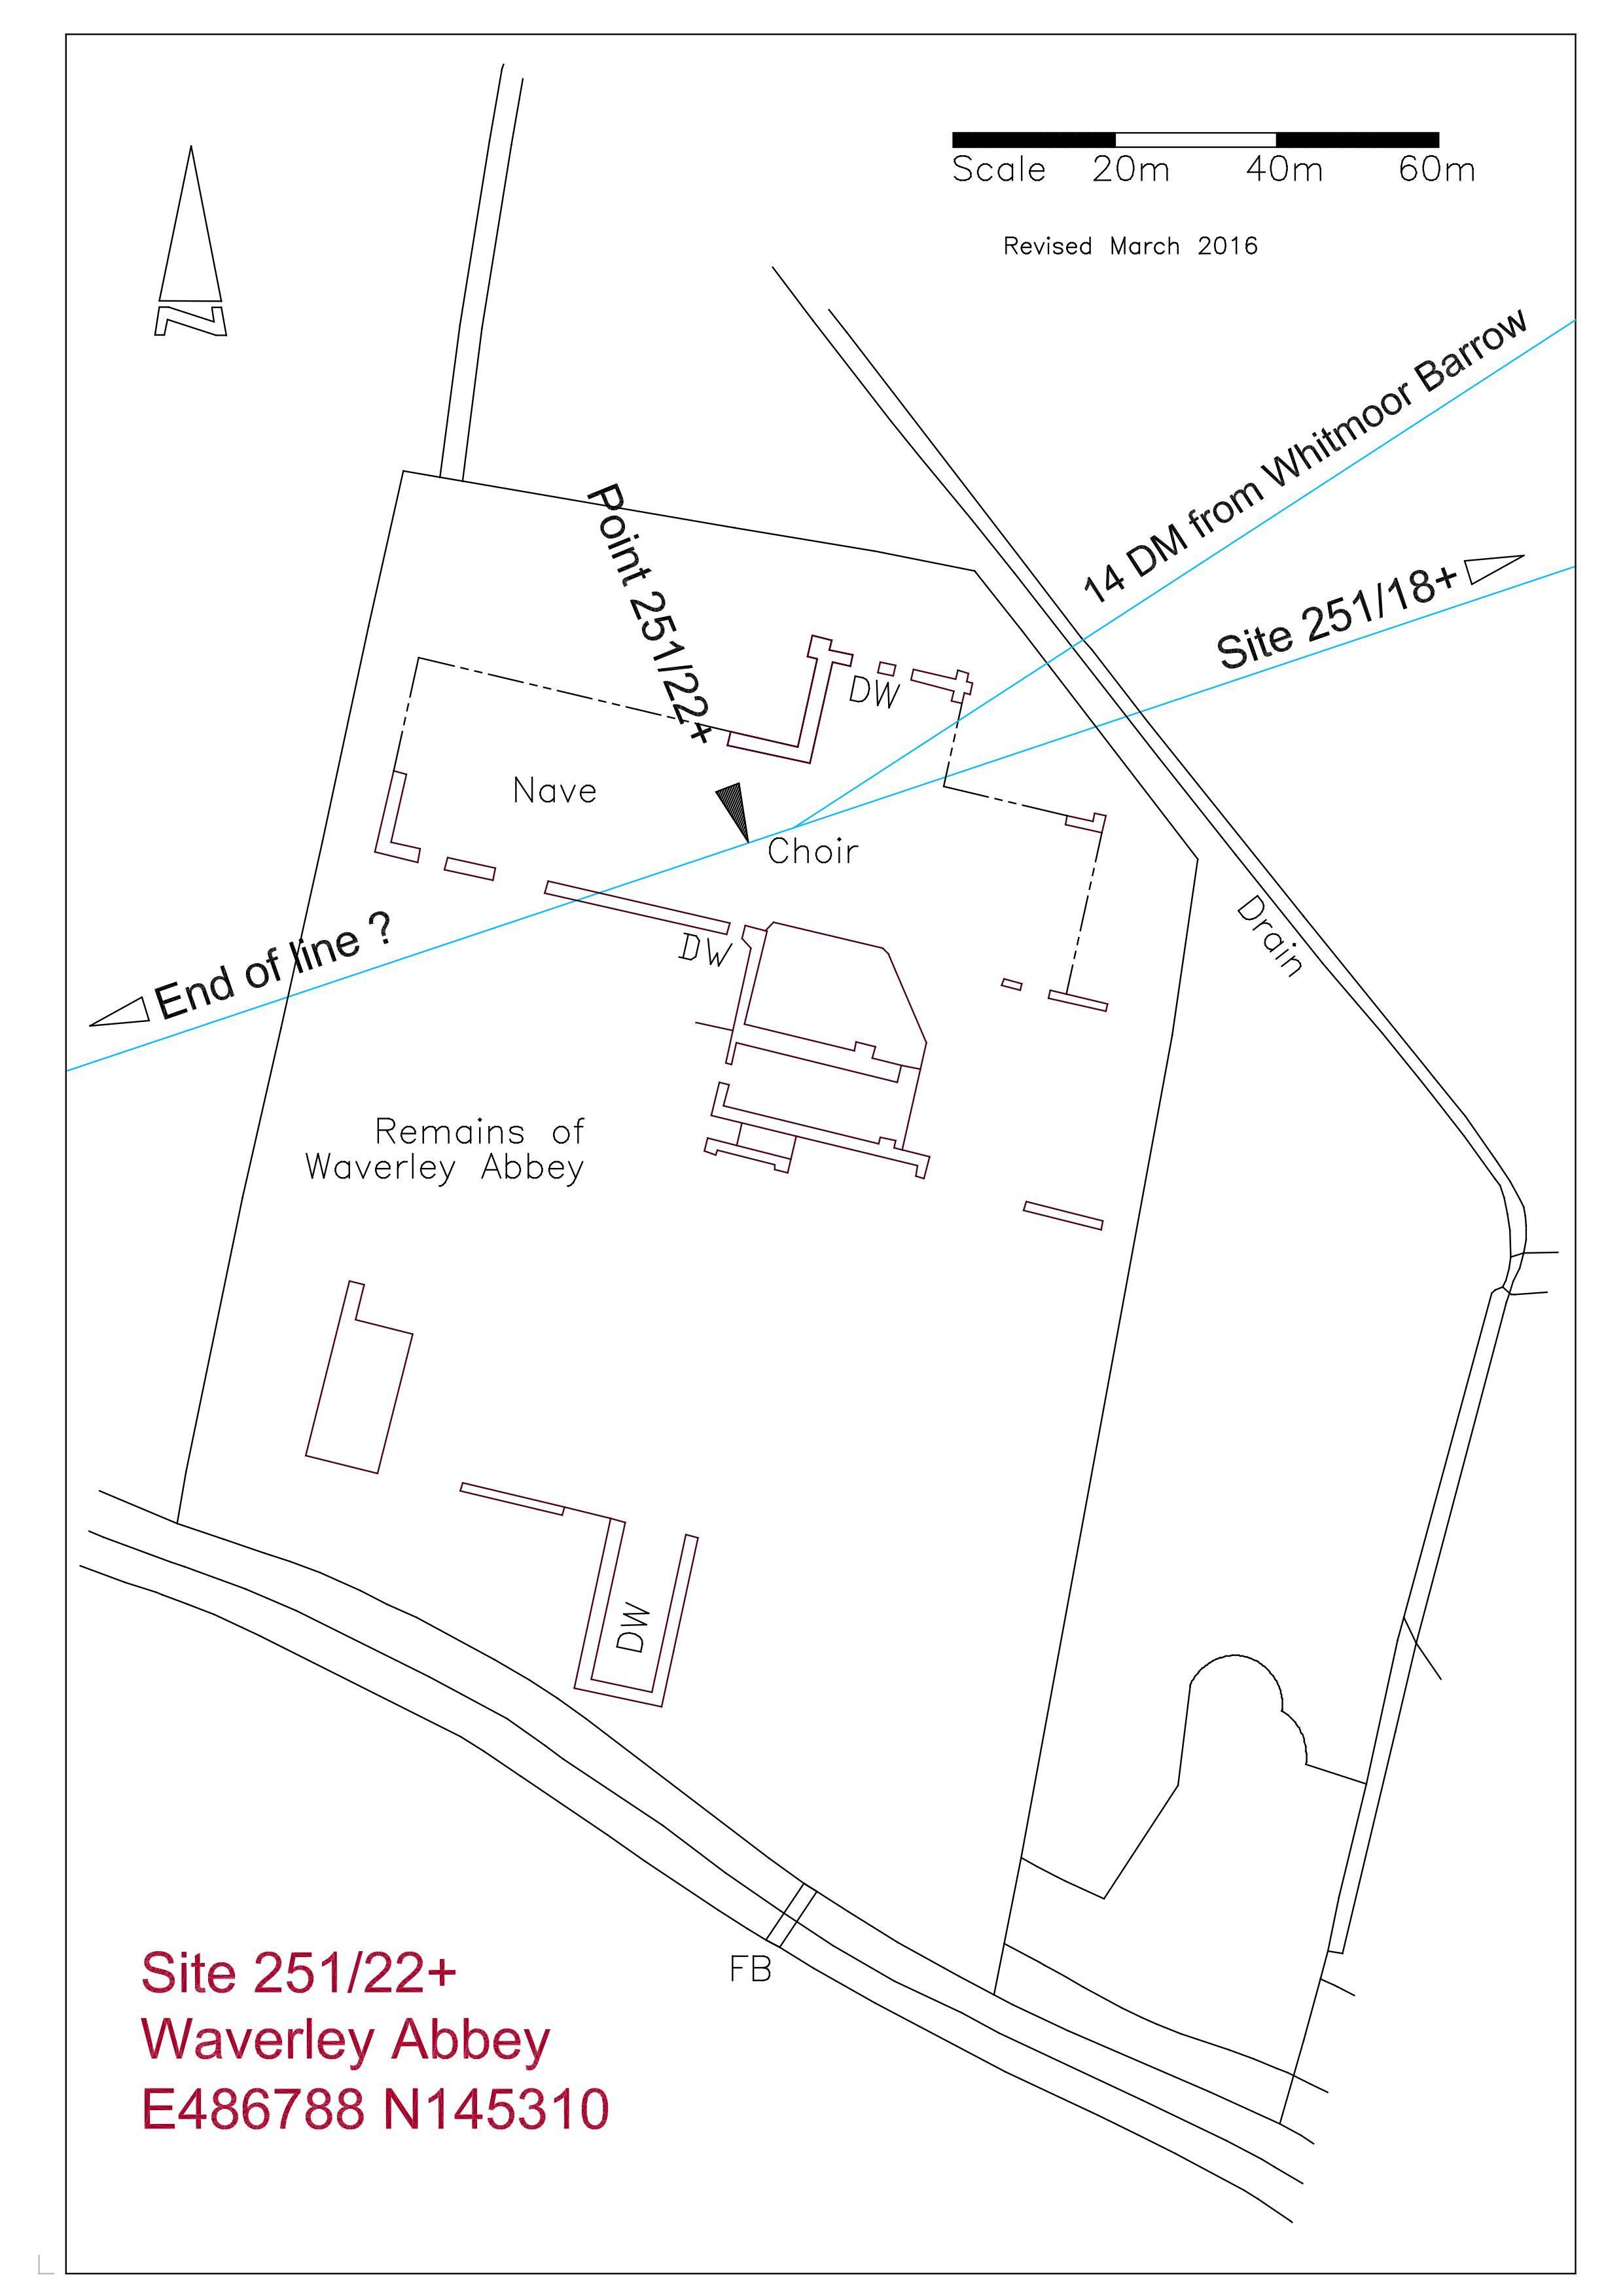 251/22 Waverley Abbey